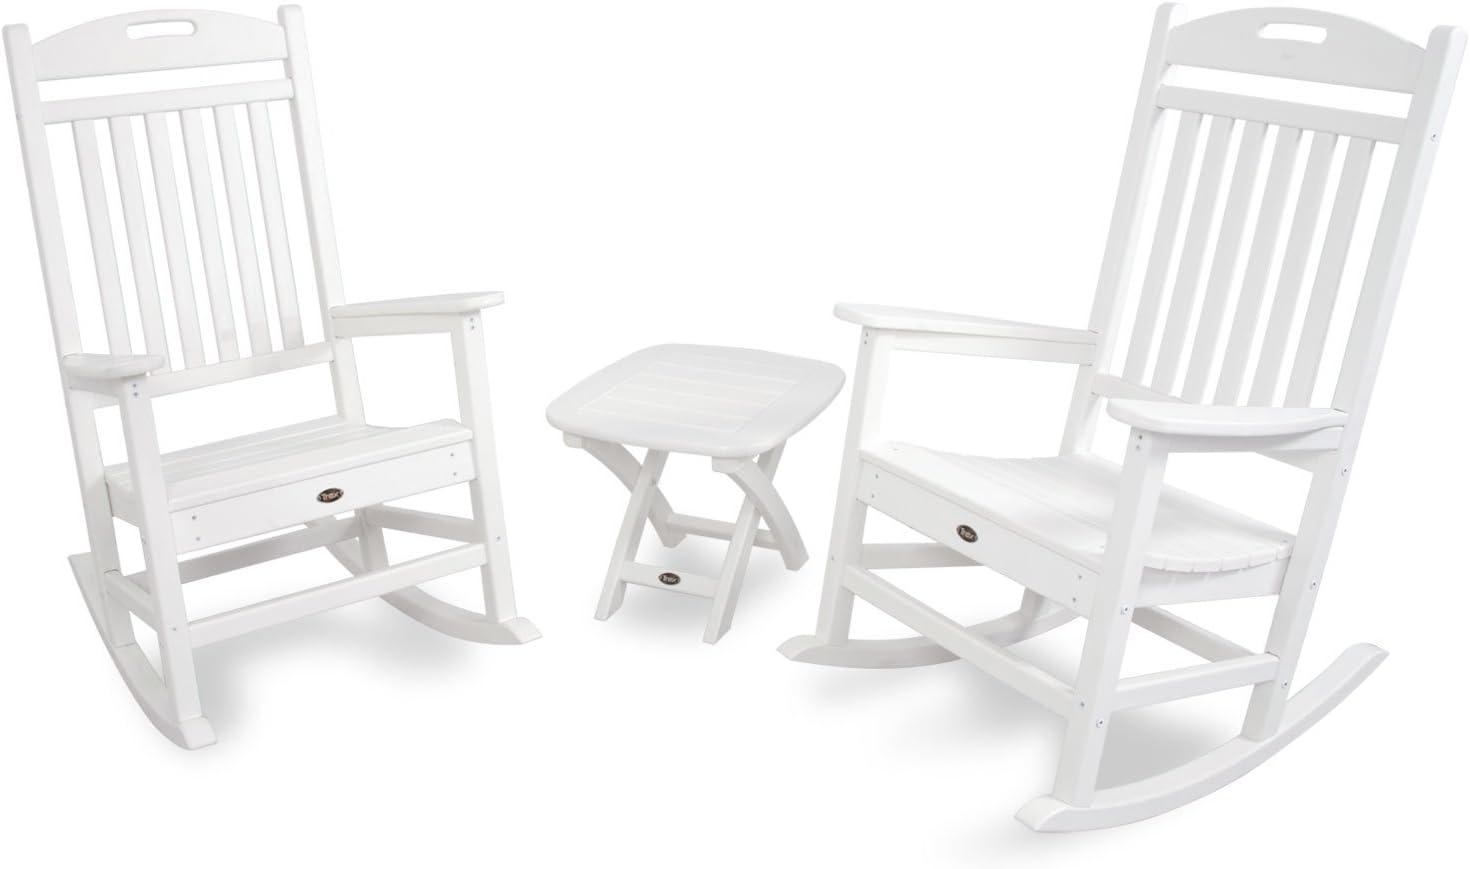 Trex Outdoor Furniture TXS121-1-CW Yacht Club 3-Piece Rocker Chair Set, Classic White